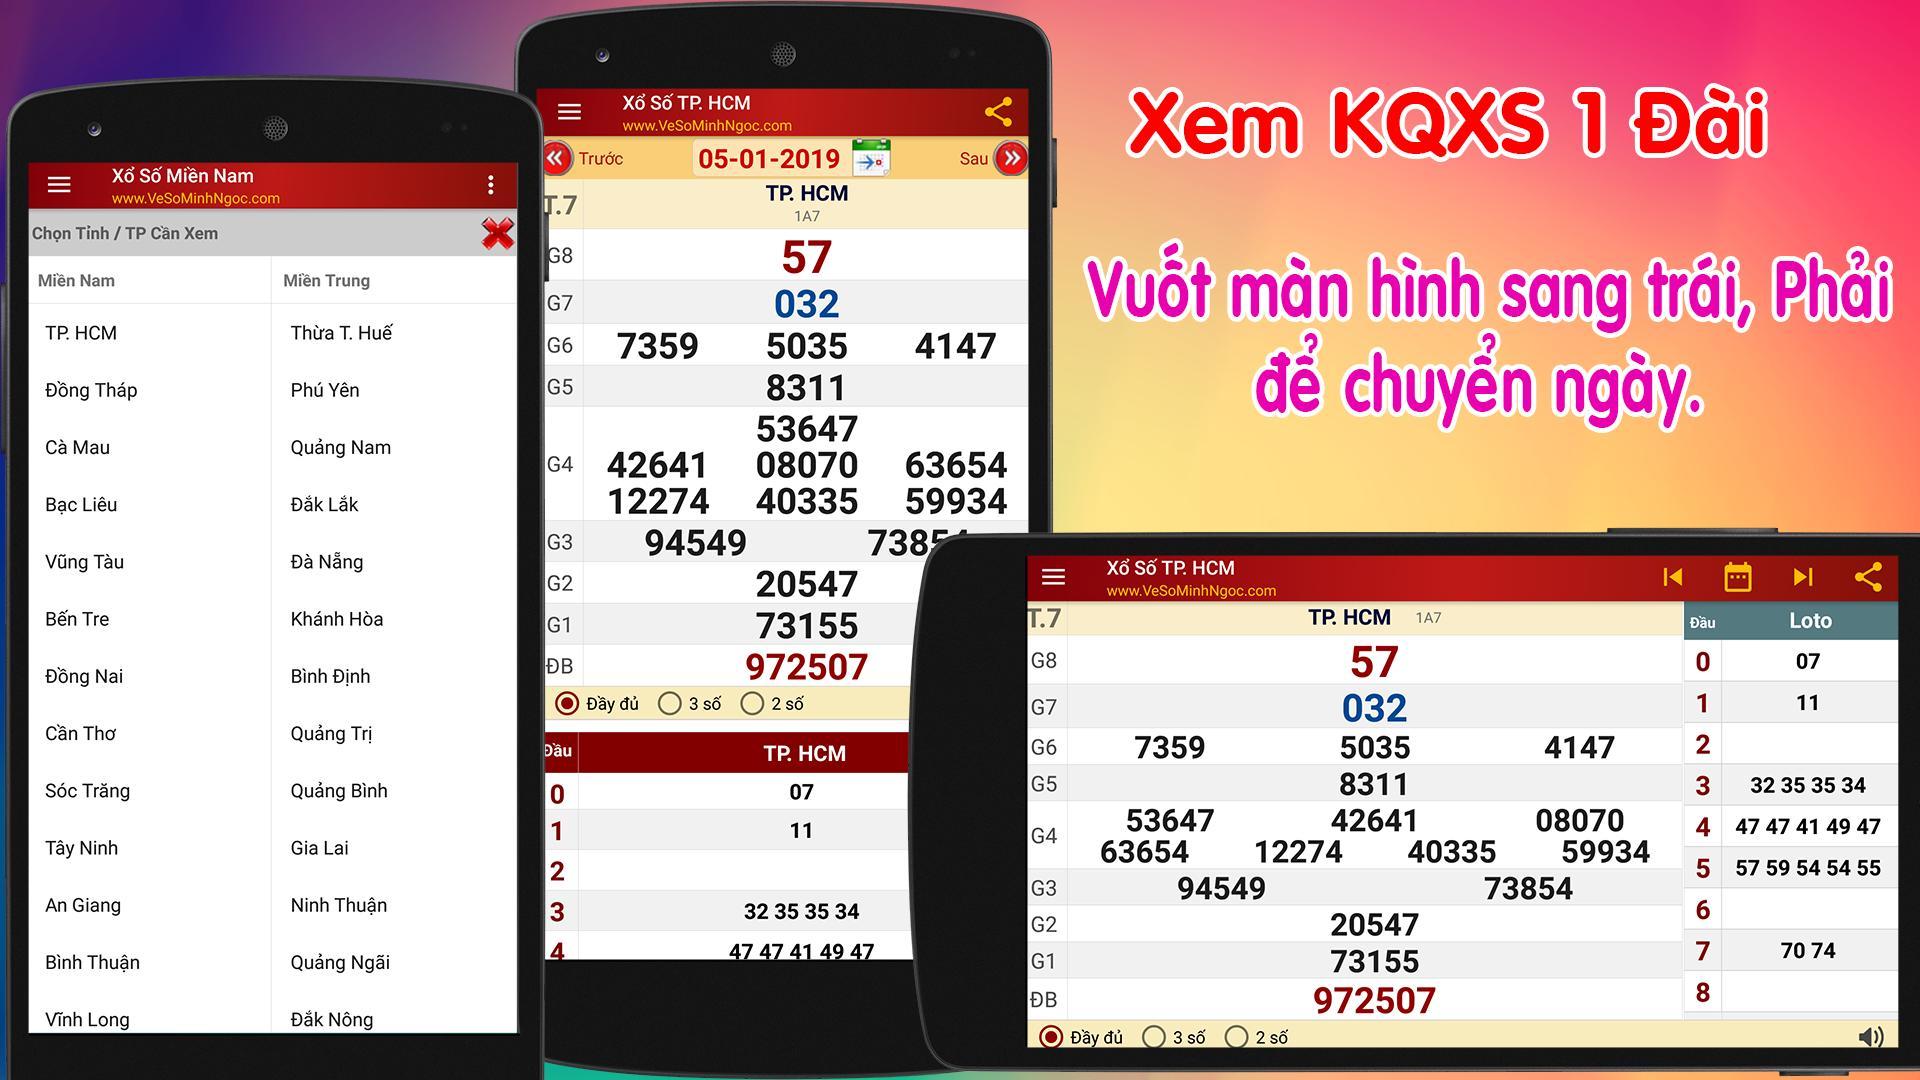 Kqxs Minh Ngọc Xs Minhngoc Xổ Số Minh Ngọc For Android Apk Download